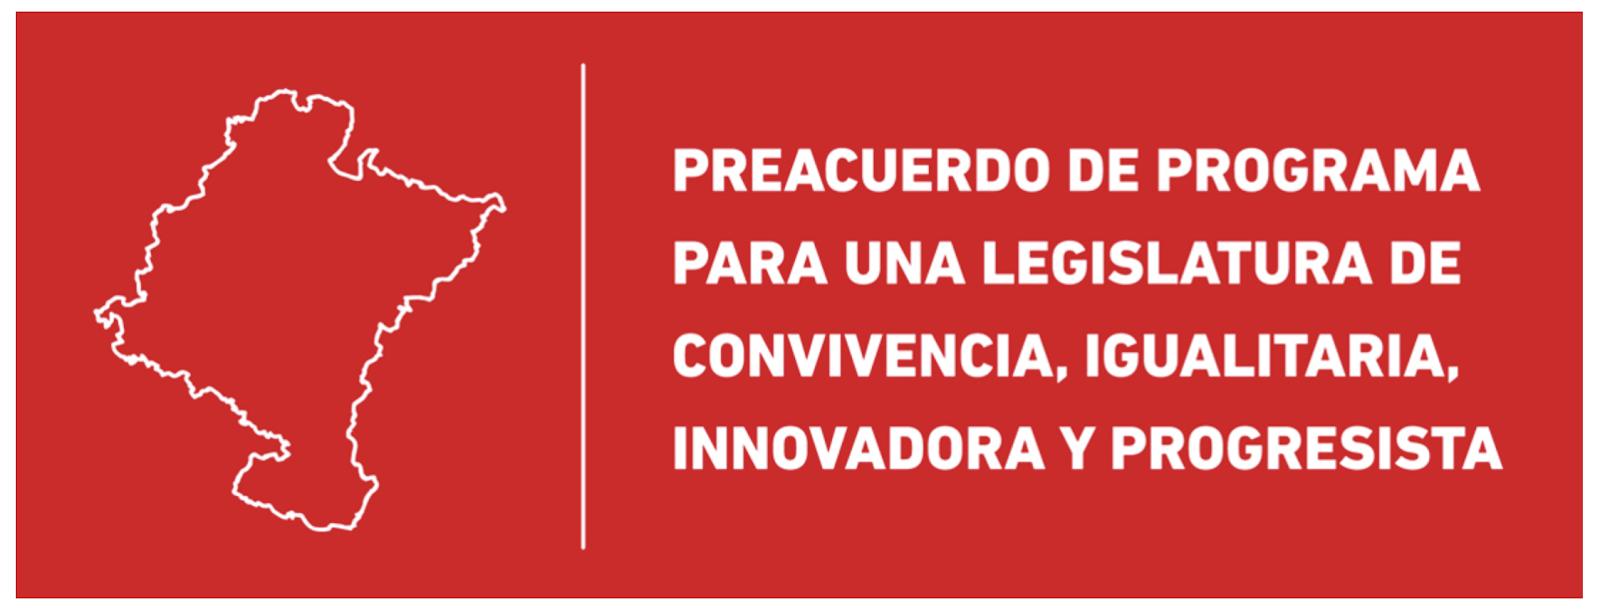 Preacuerdo de programa Navarra 2019-2023